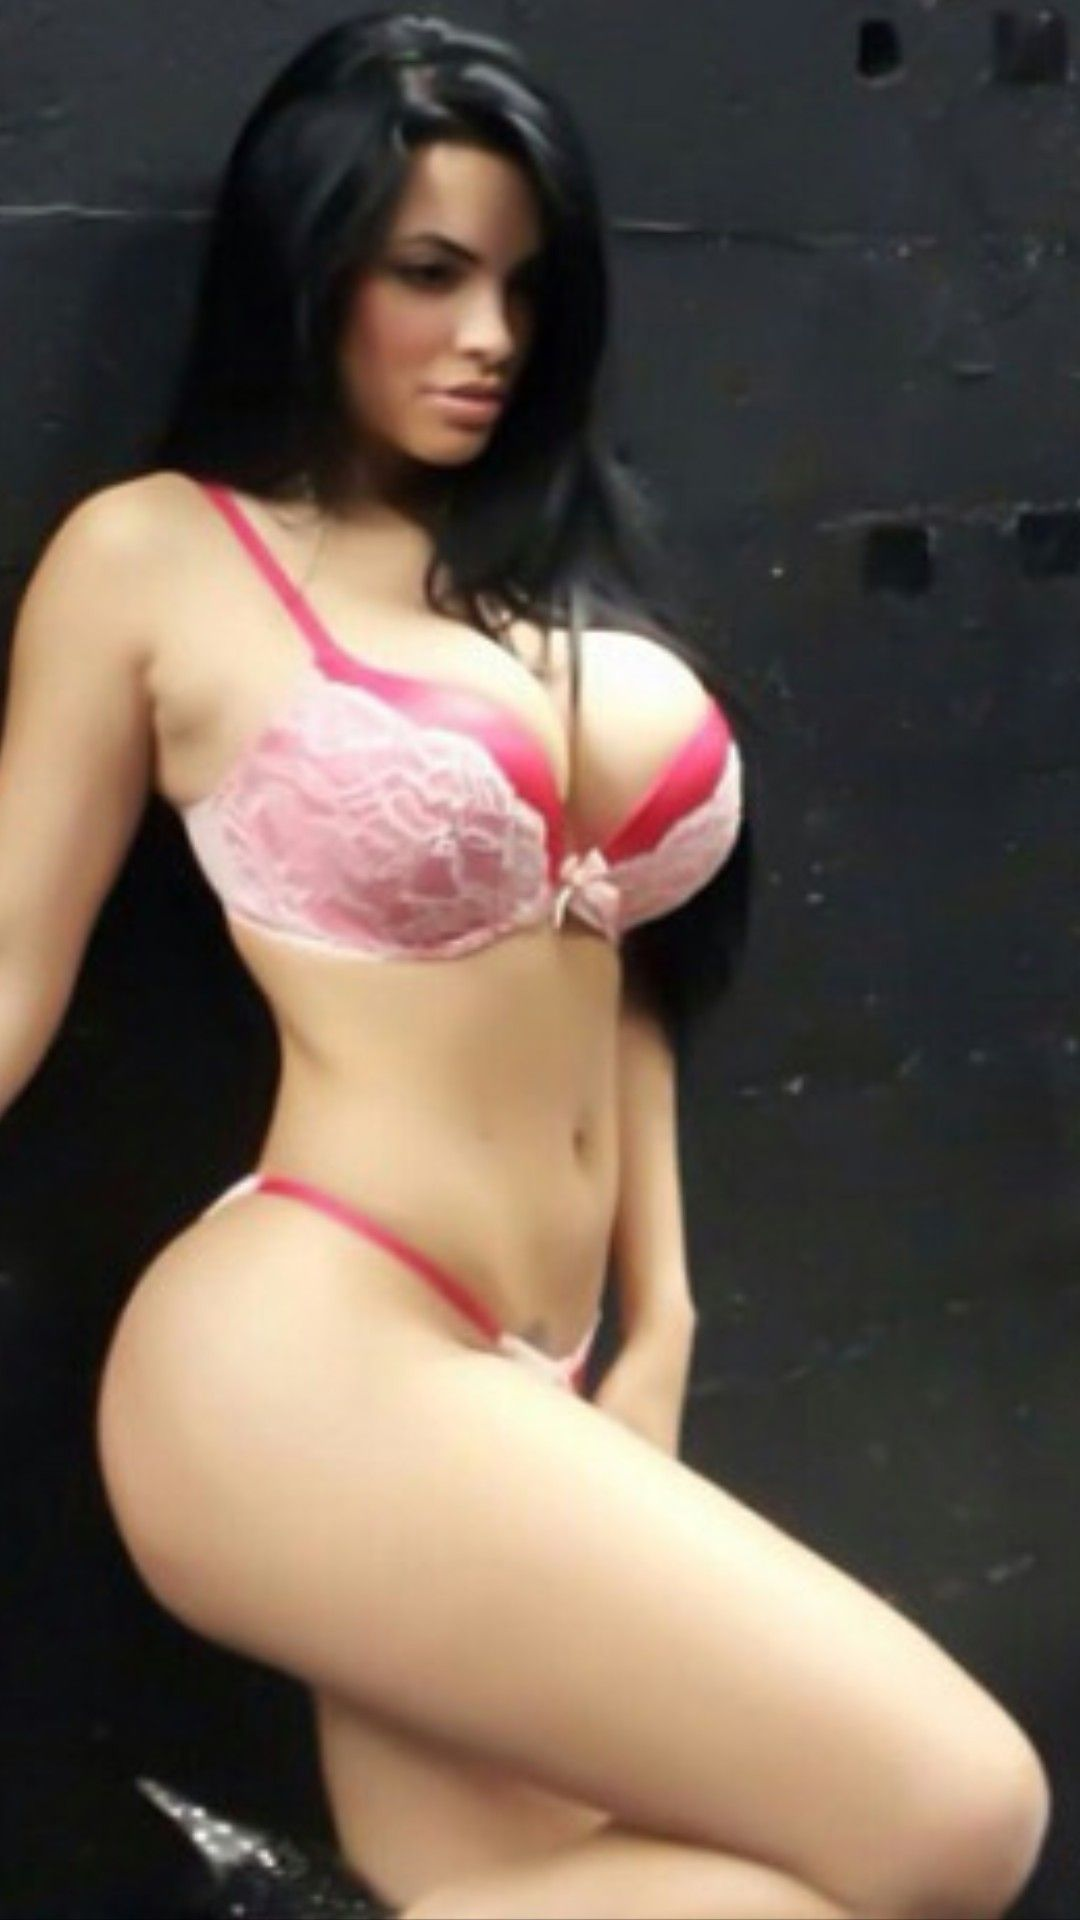 Bul with girl sex pics